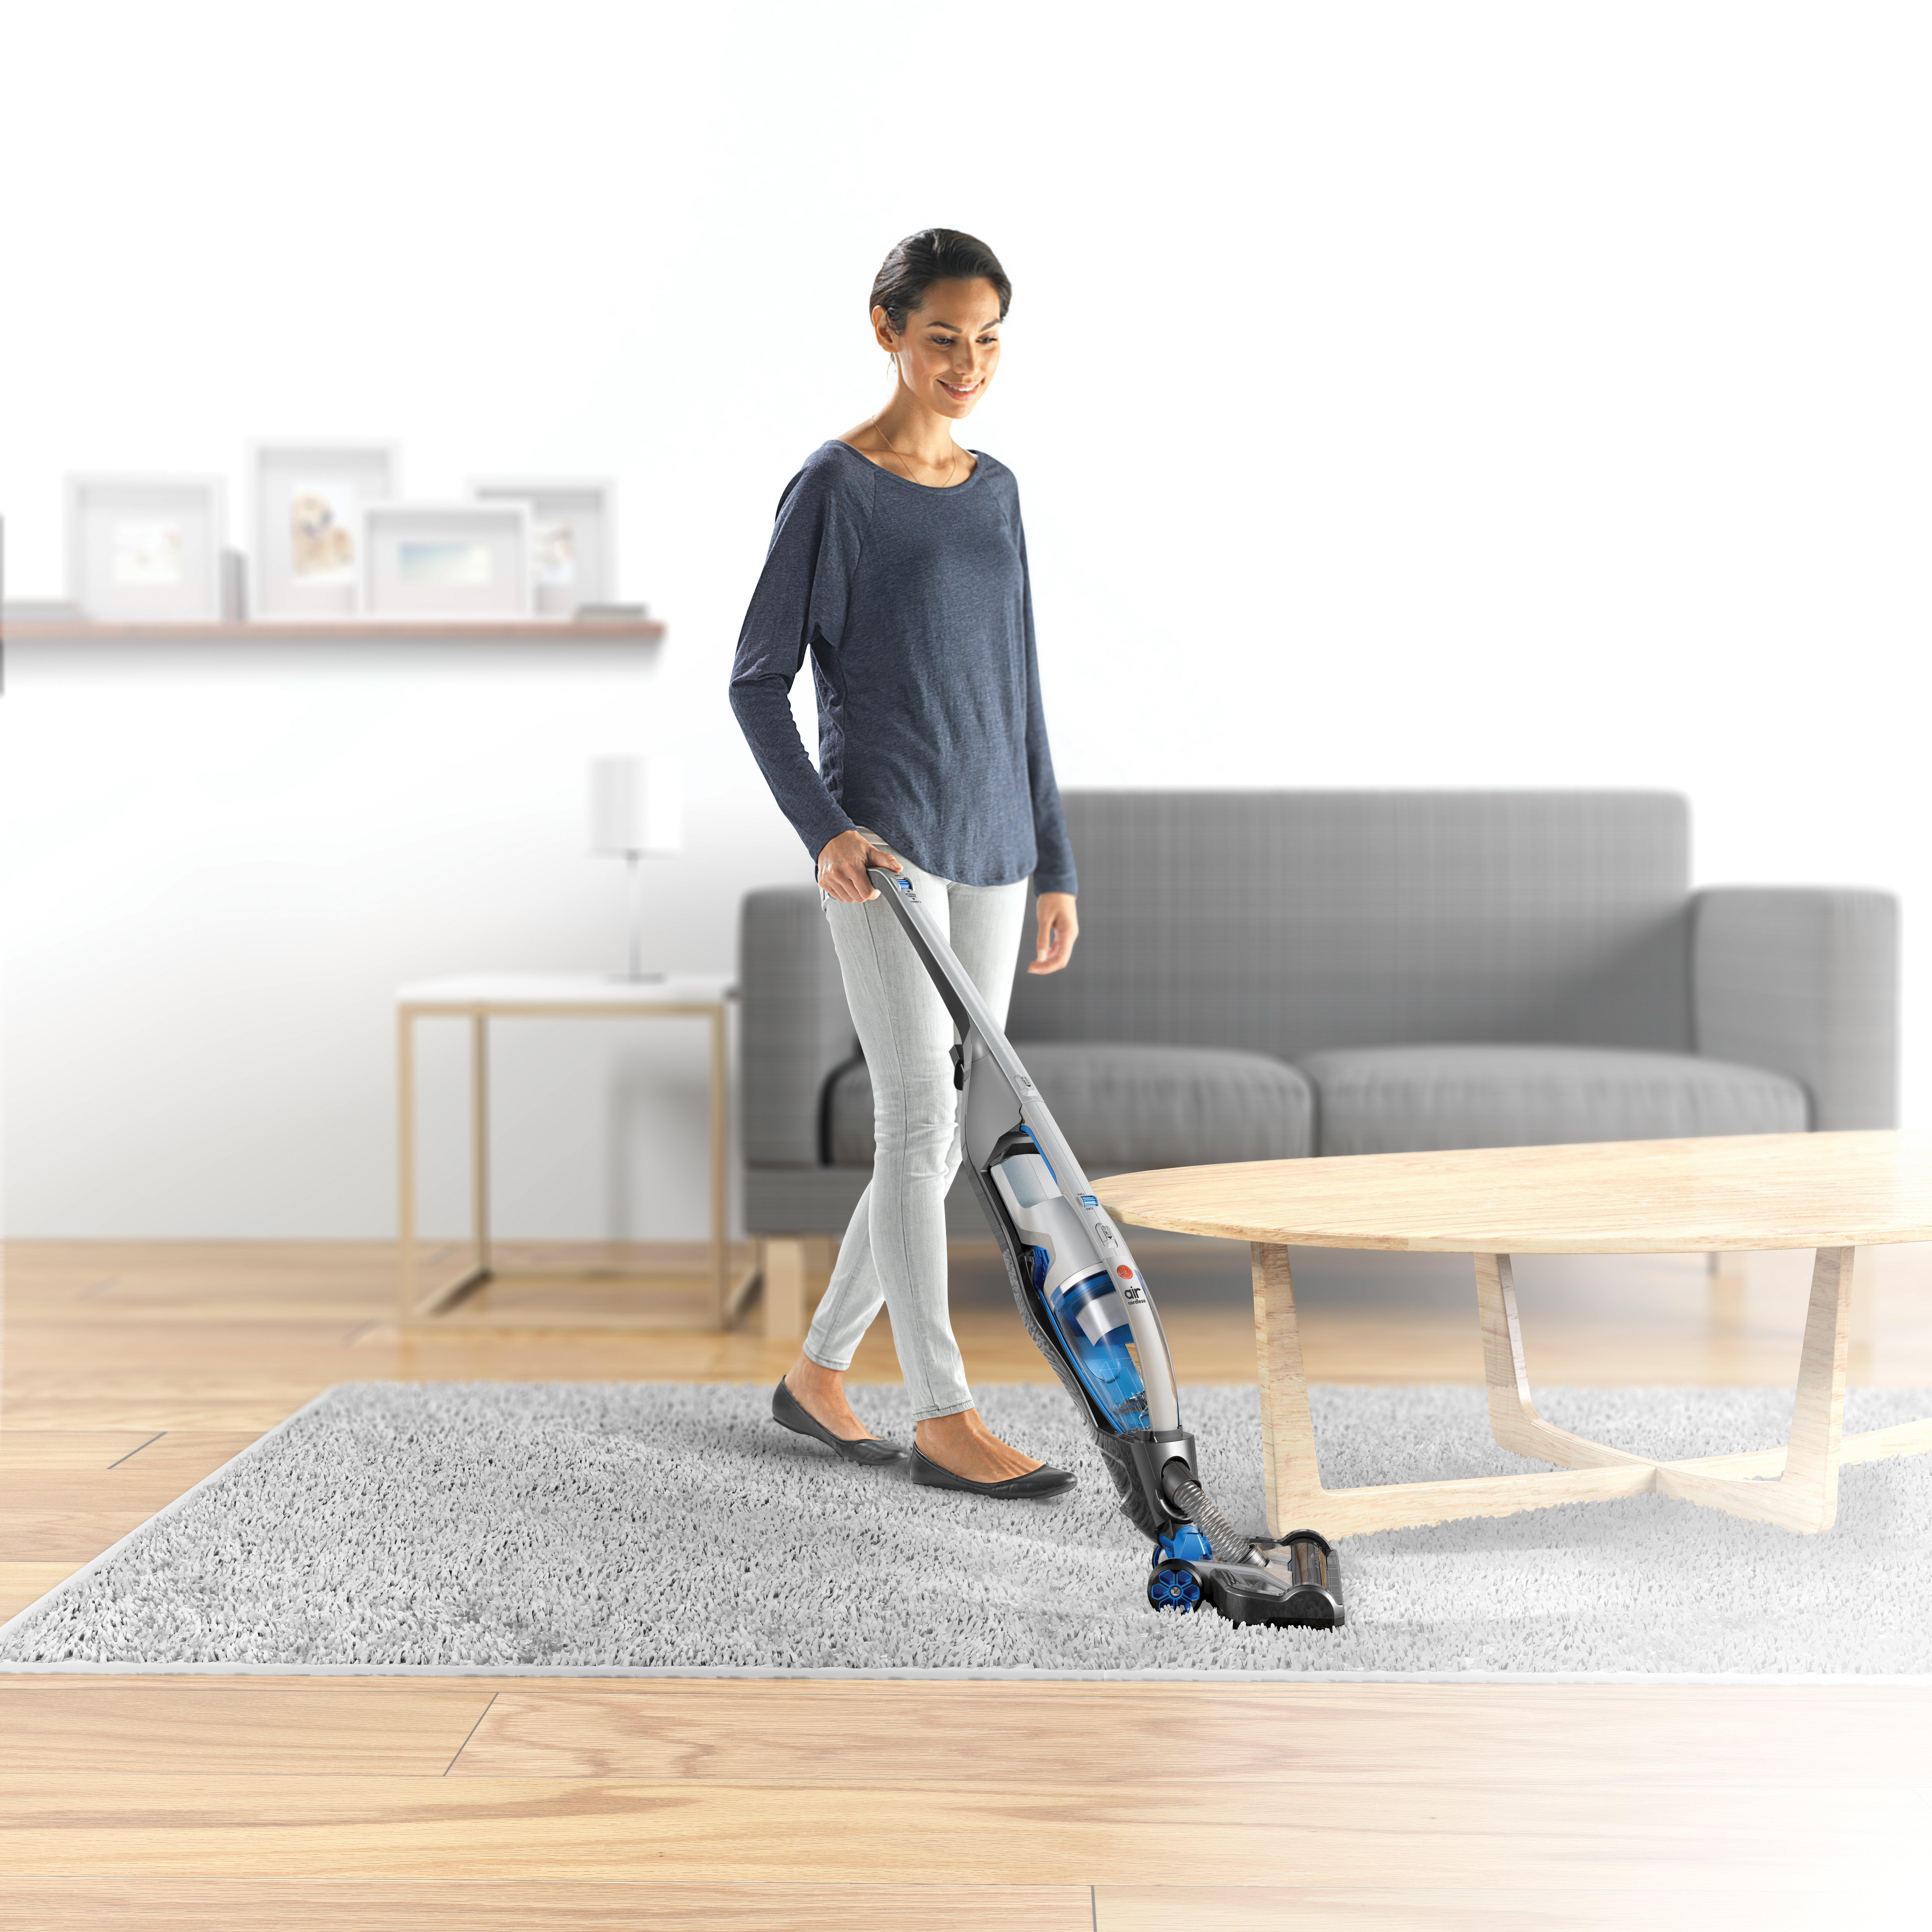 Air Cordless 2-in-1 Stick & Handheld Vacuum4